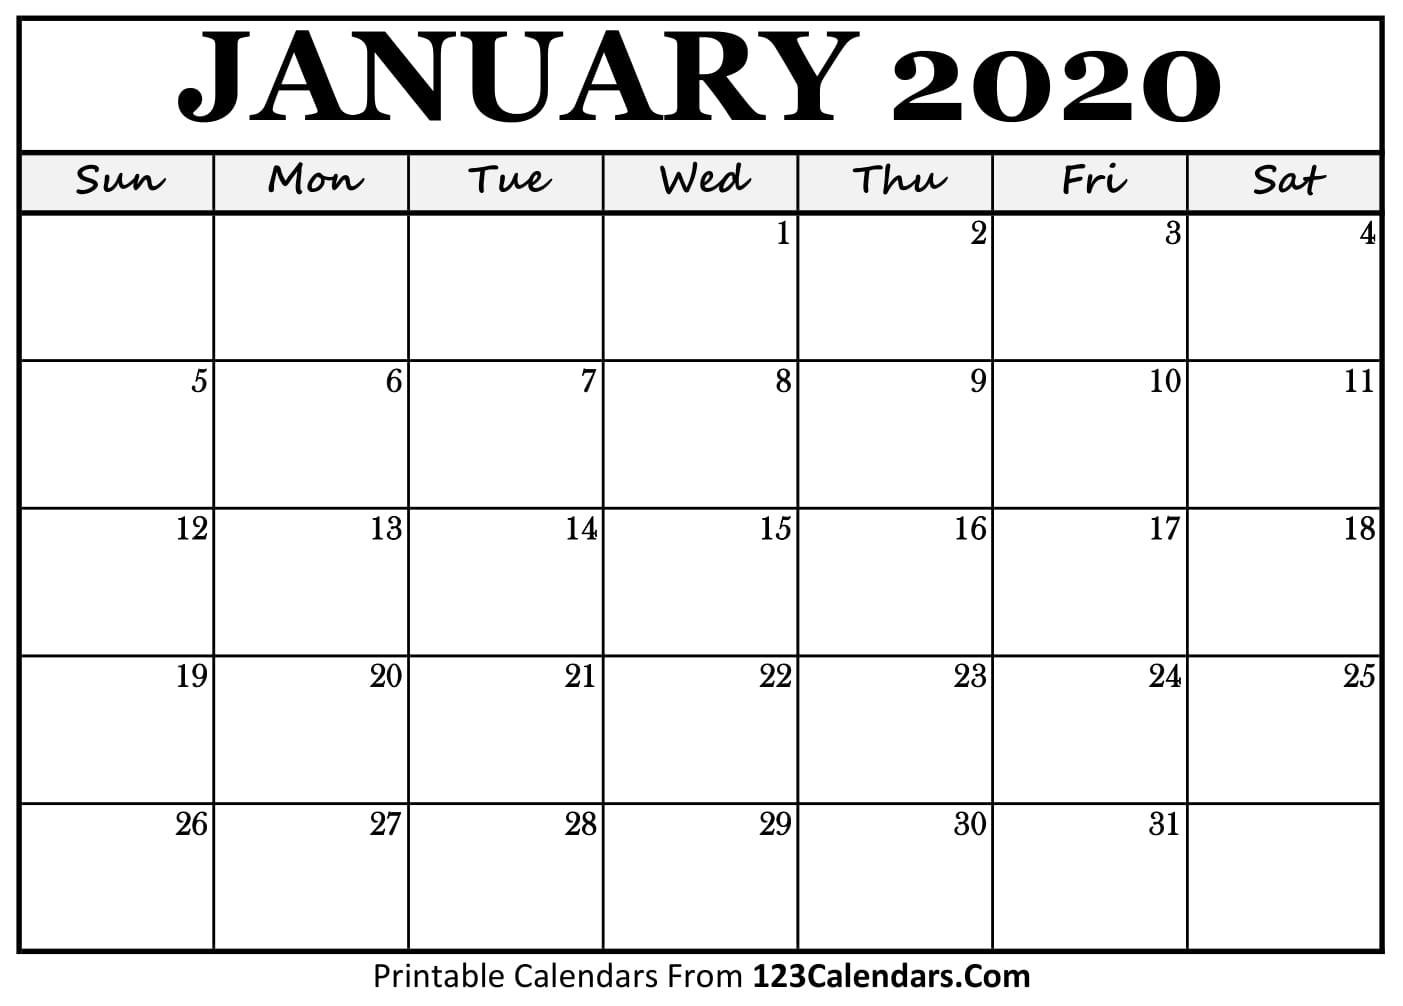 Free Printable Calendar | 123Calendars-Blank Printable Calendar 2020 Monthly